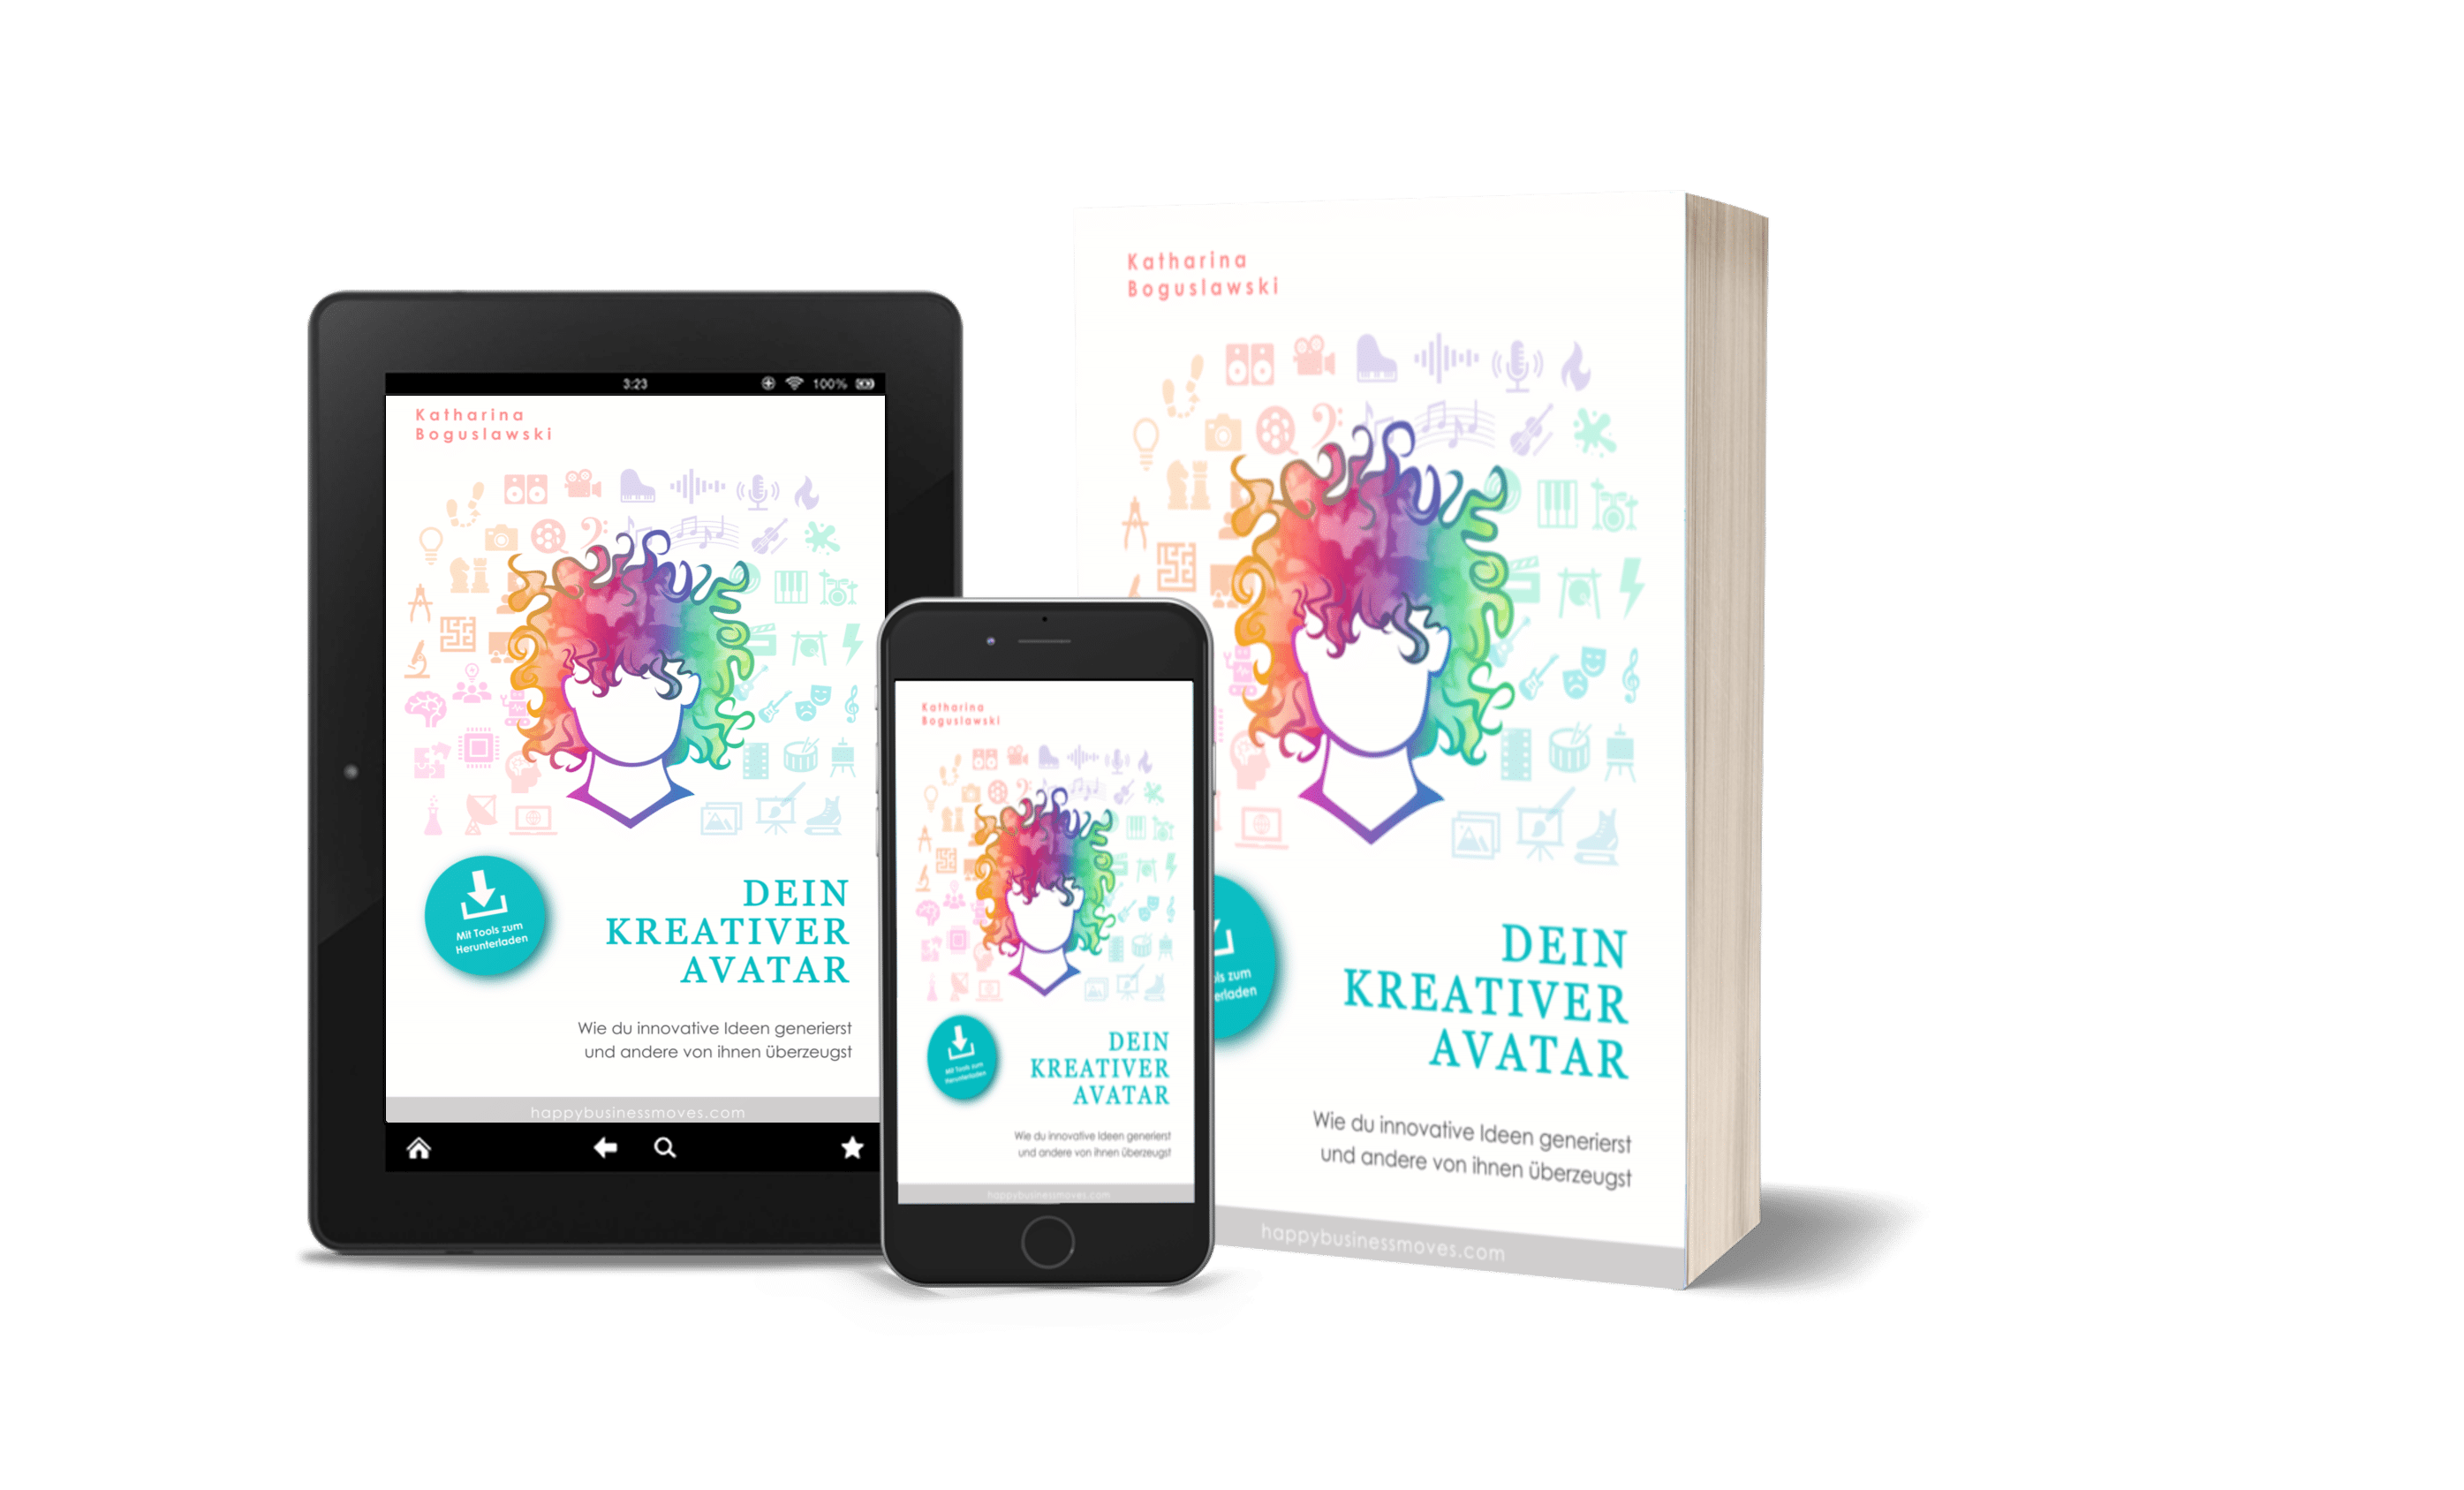 Buch-Dein-kreativer-Avatar-Katharina-Boguslawski